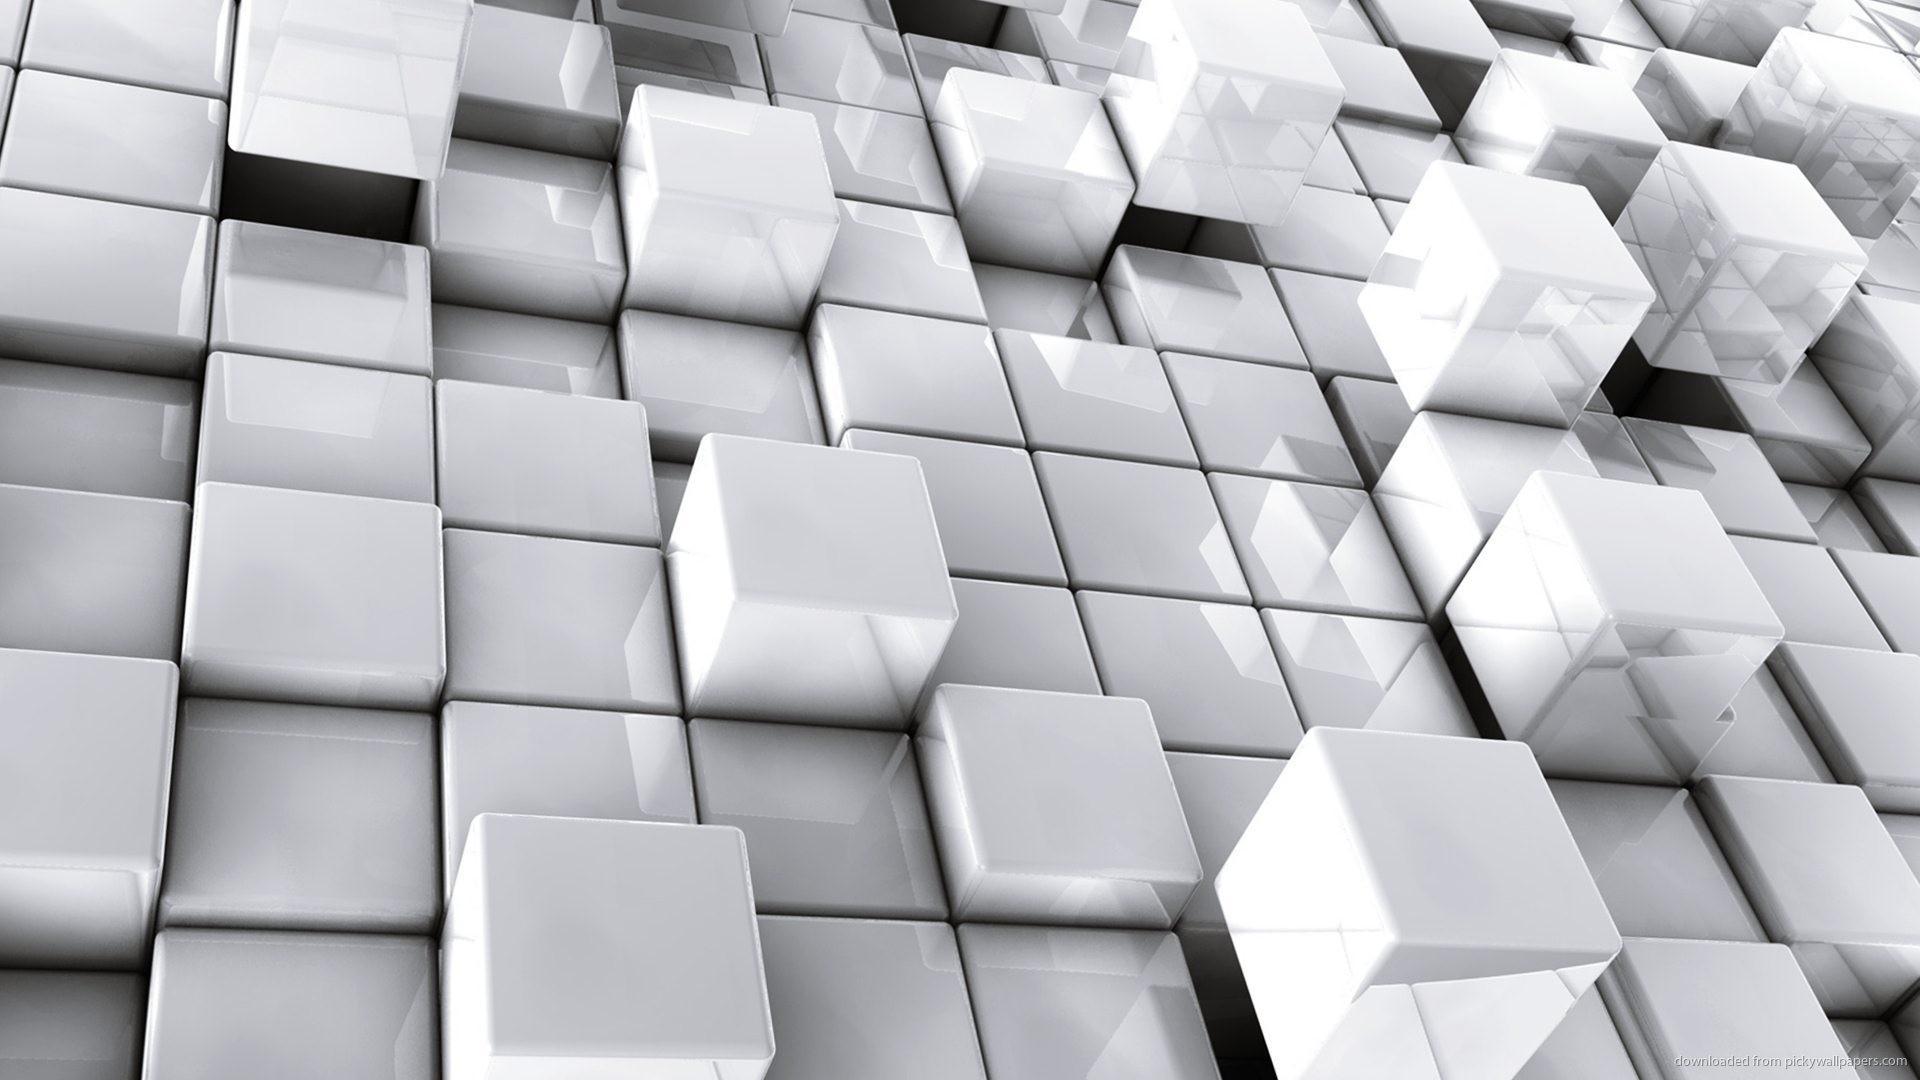 Abstract White 3D Cubes Desktop Wallpaper picture